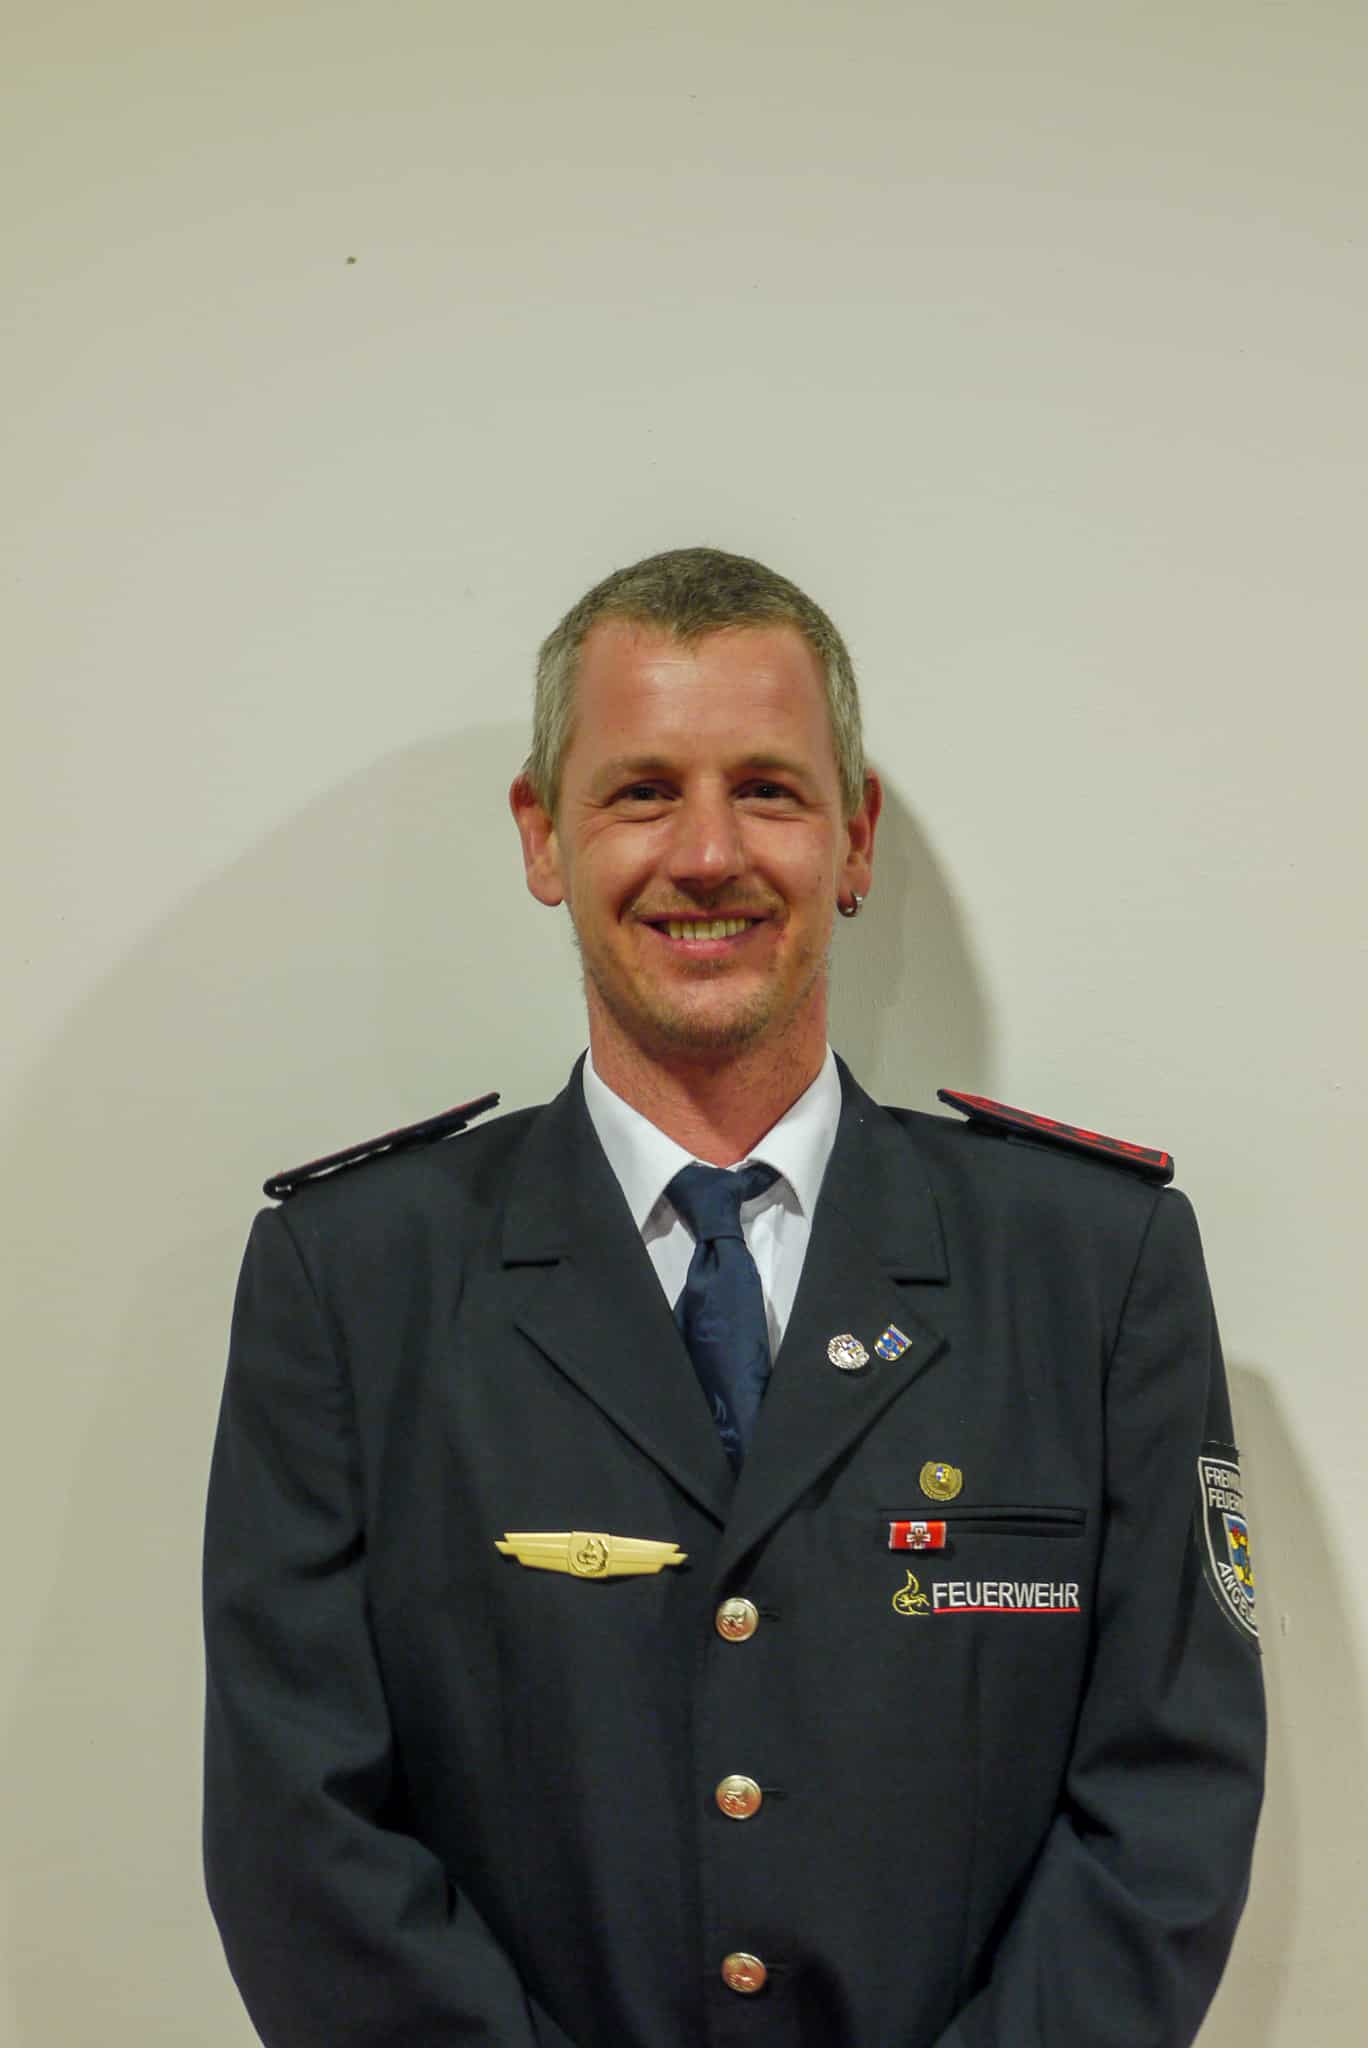 Thorsten Rettenbacher